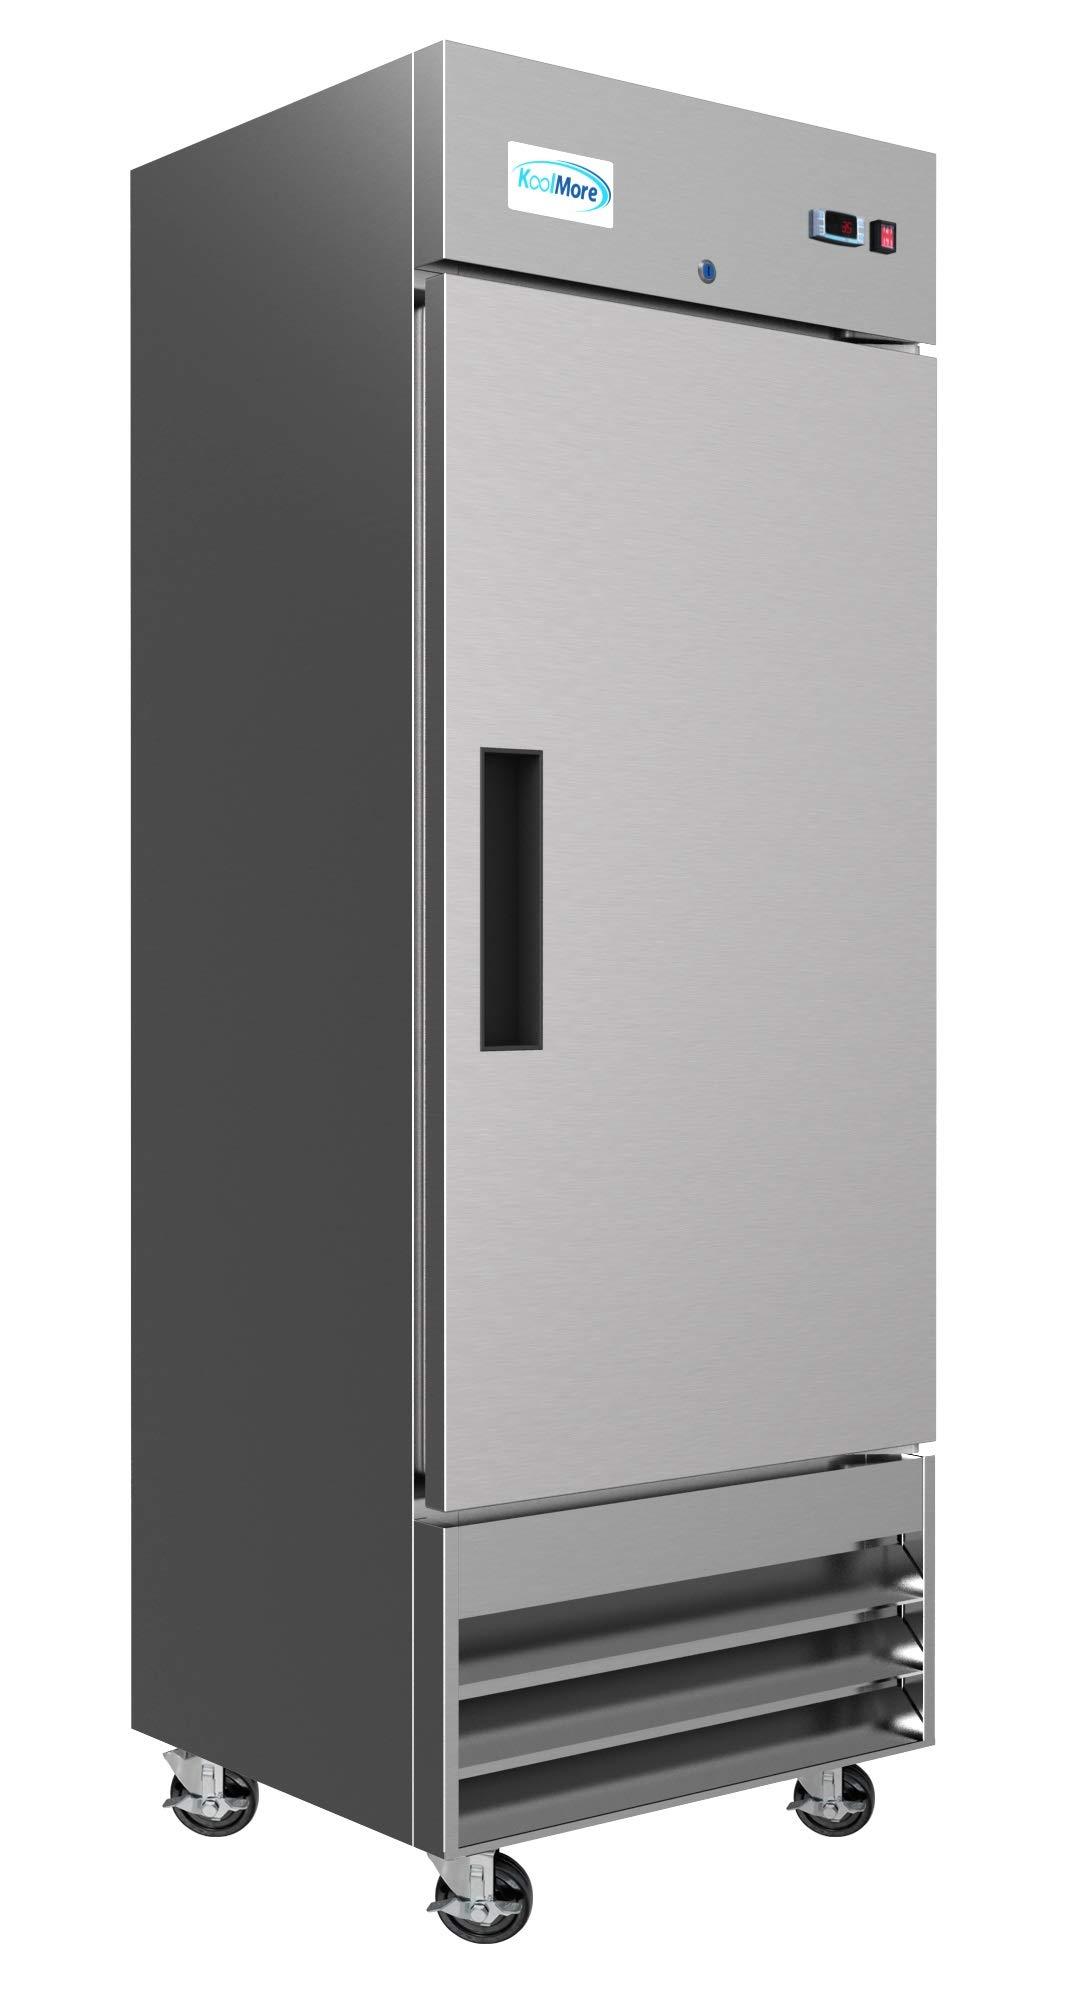 KoolMore 29″ Stainless Steel Solid Door Commercial Reach-in Refrigerator Cooler – 19 cu. ft (RIR-1D-SS-19C)